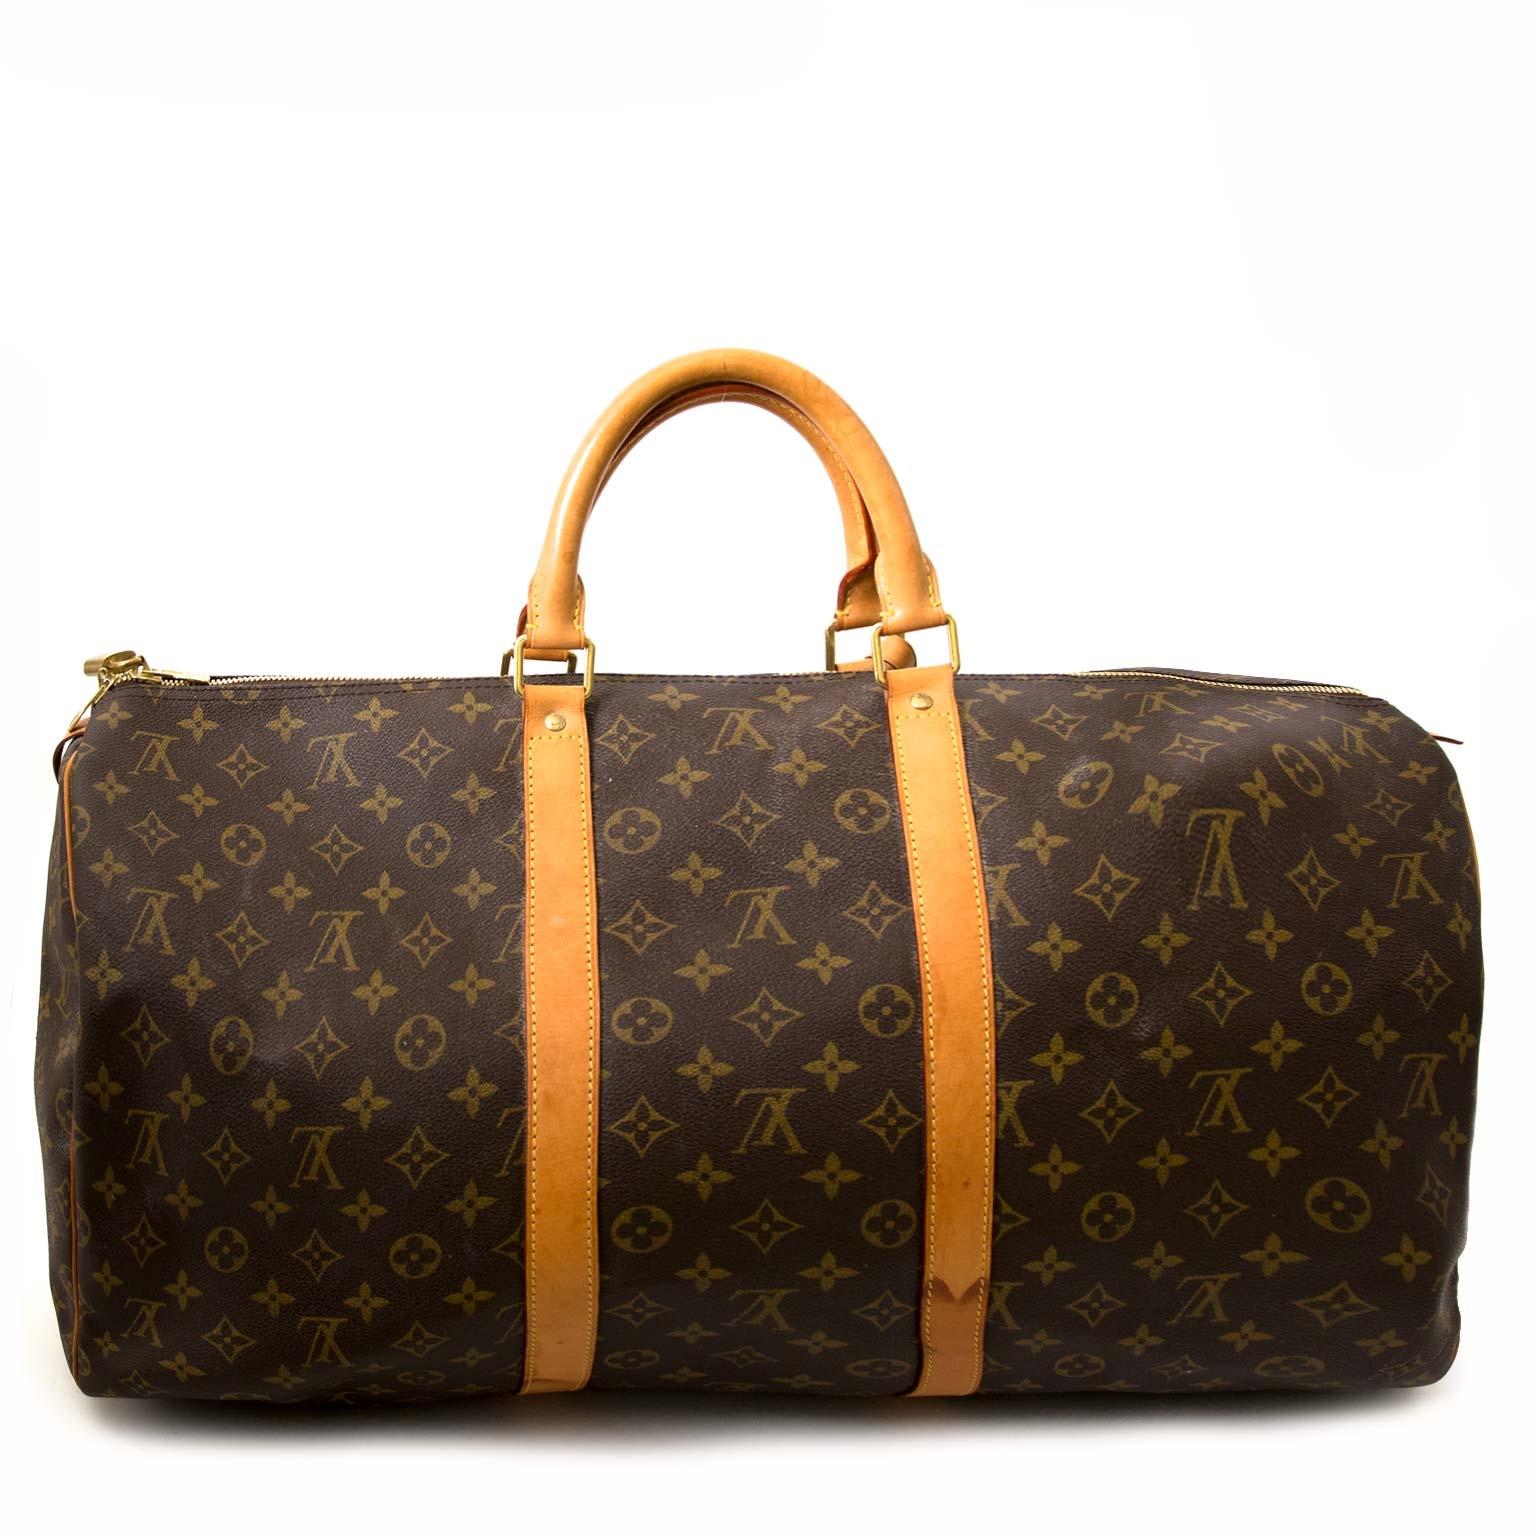 91bff2fd Labellov Shop Authentic Vintage Luxury Designer Handbags Online ...